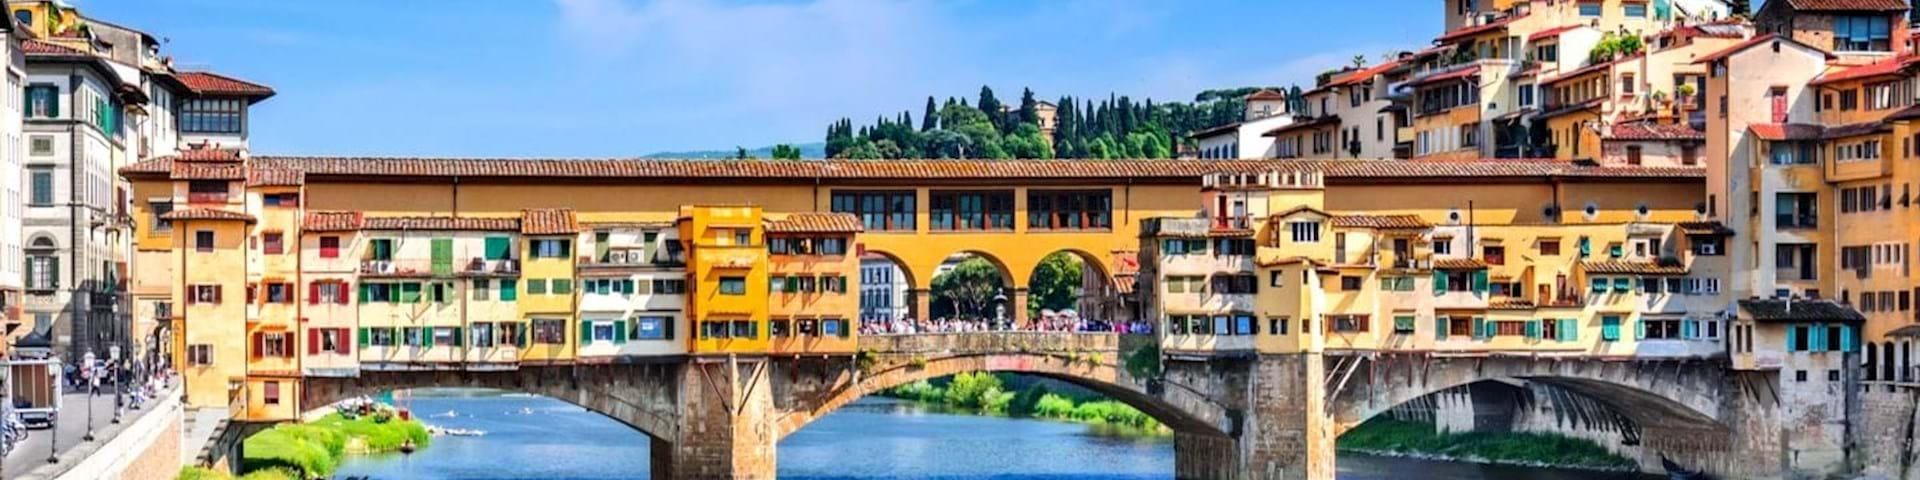 Ponte Vecchio Tours